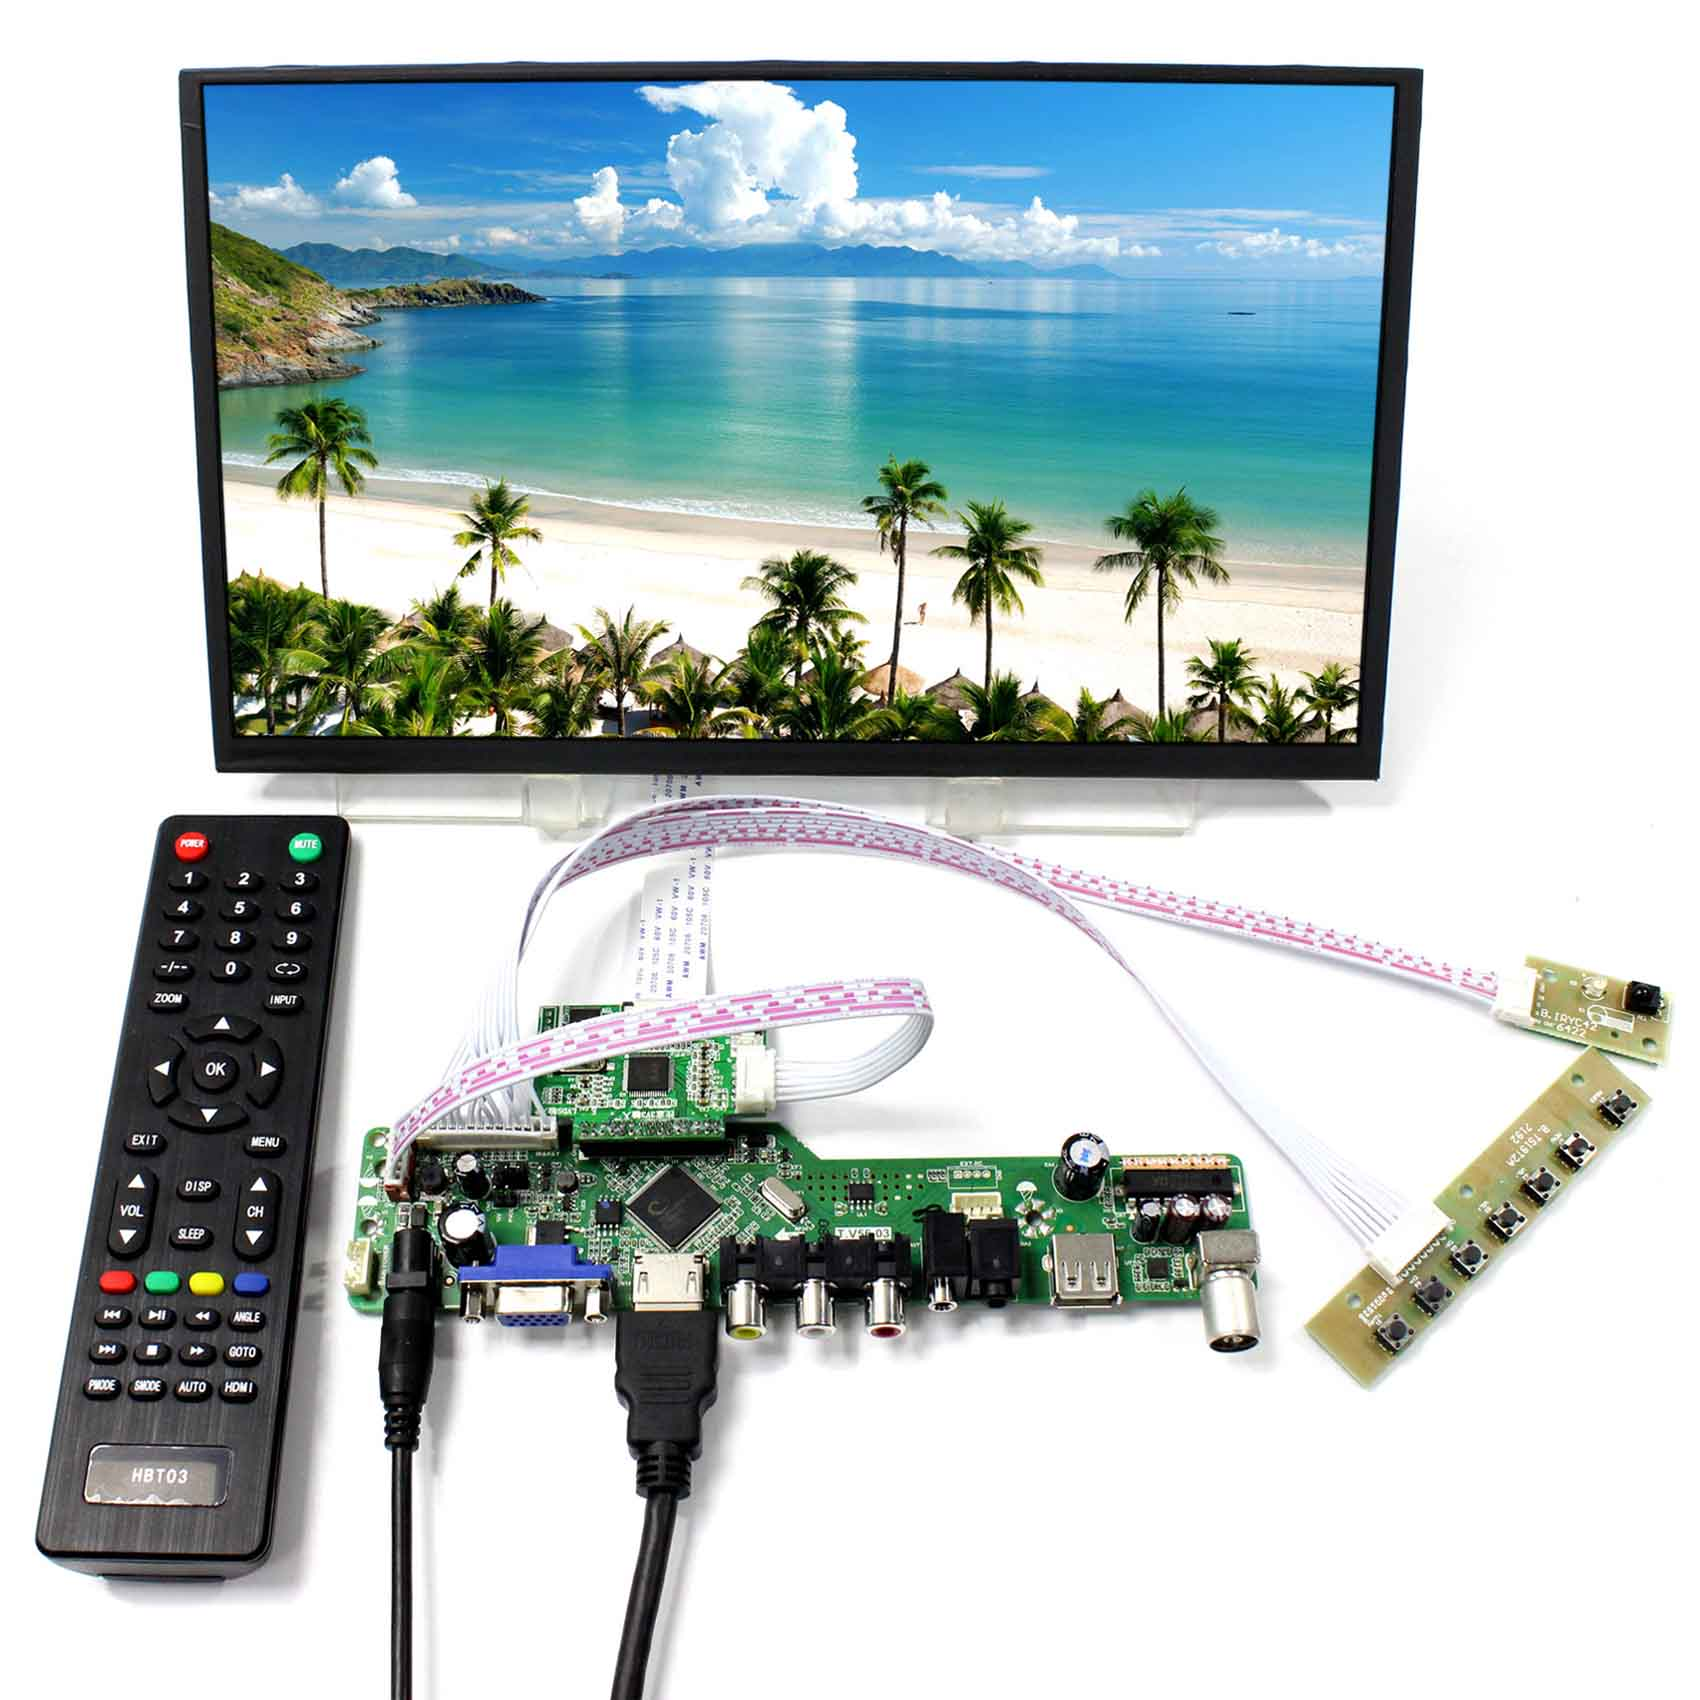 11.6 1920X1080 Resolution M116X40 HDMI VGA CVBS RF USB LCD Driver Board hdmi vga cvbs audio usb driver board n101icg hsd101pww 10 1 1280 800 ips lcd